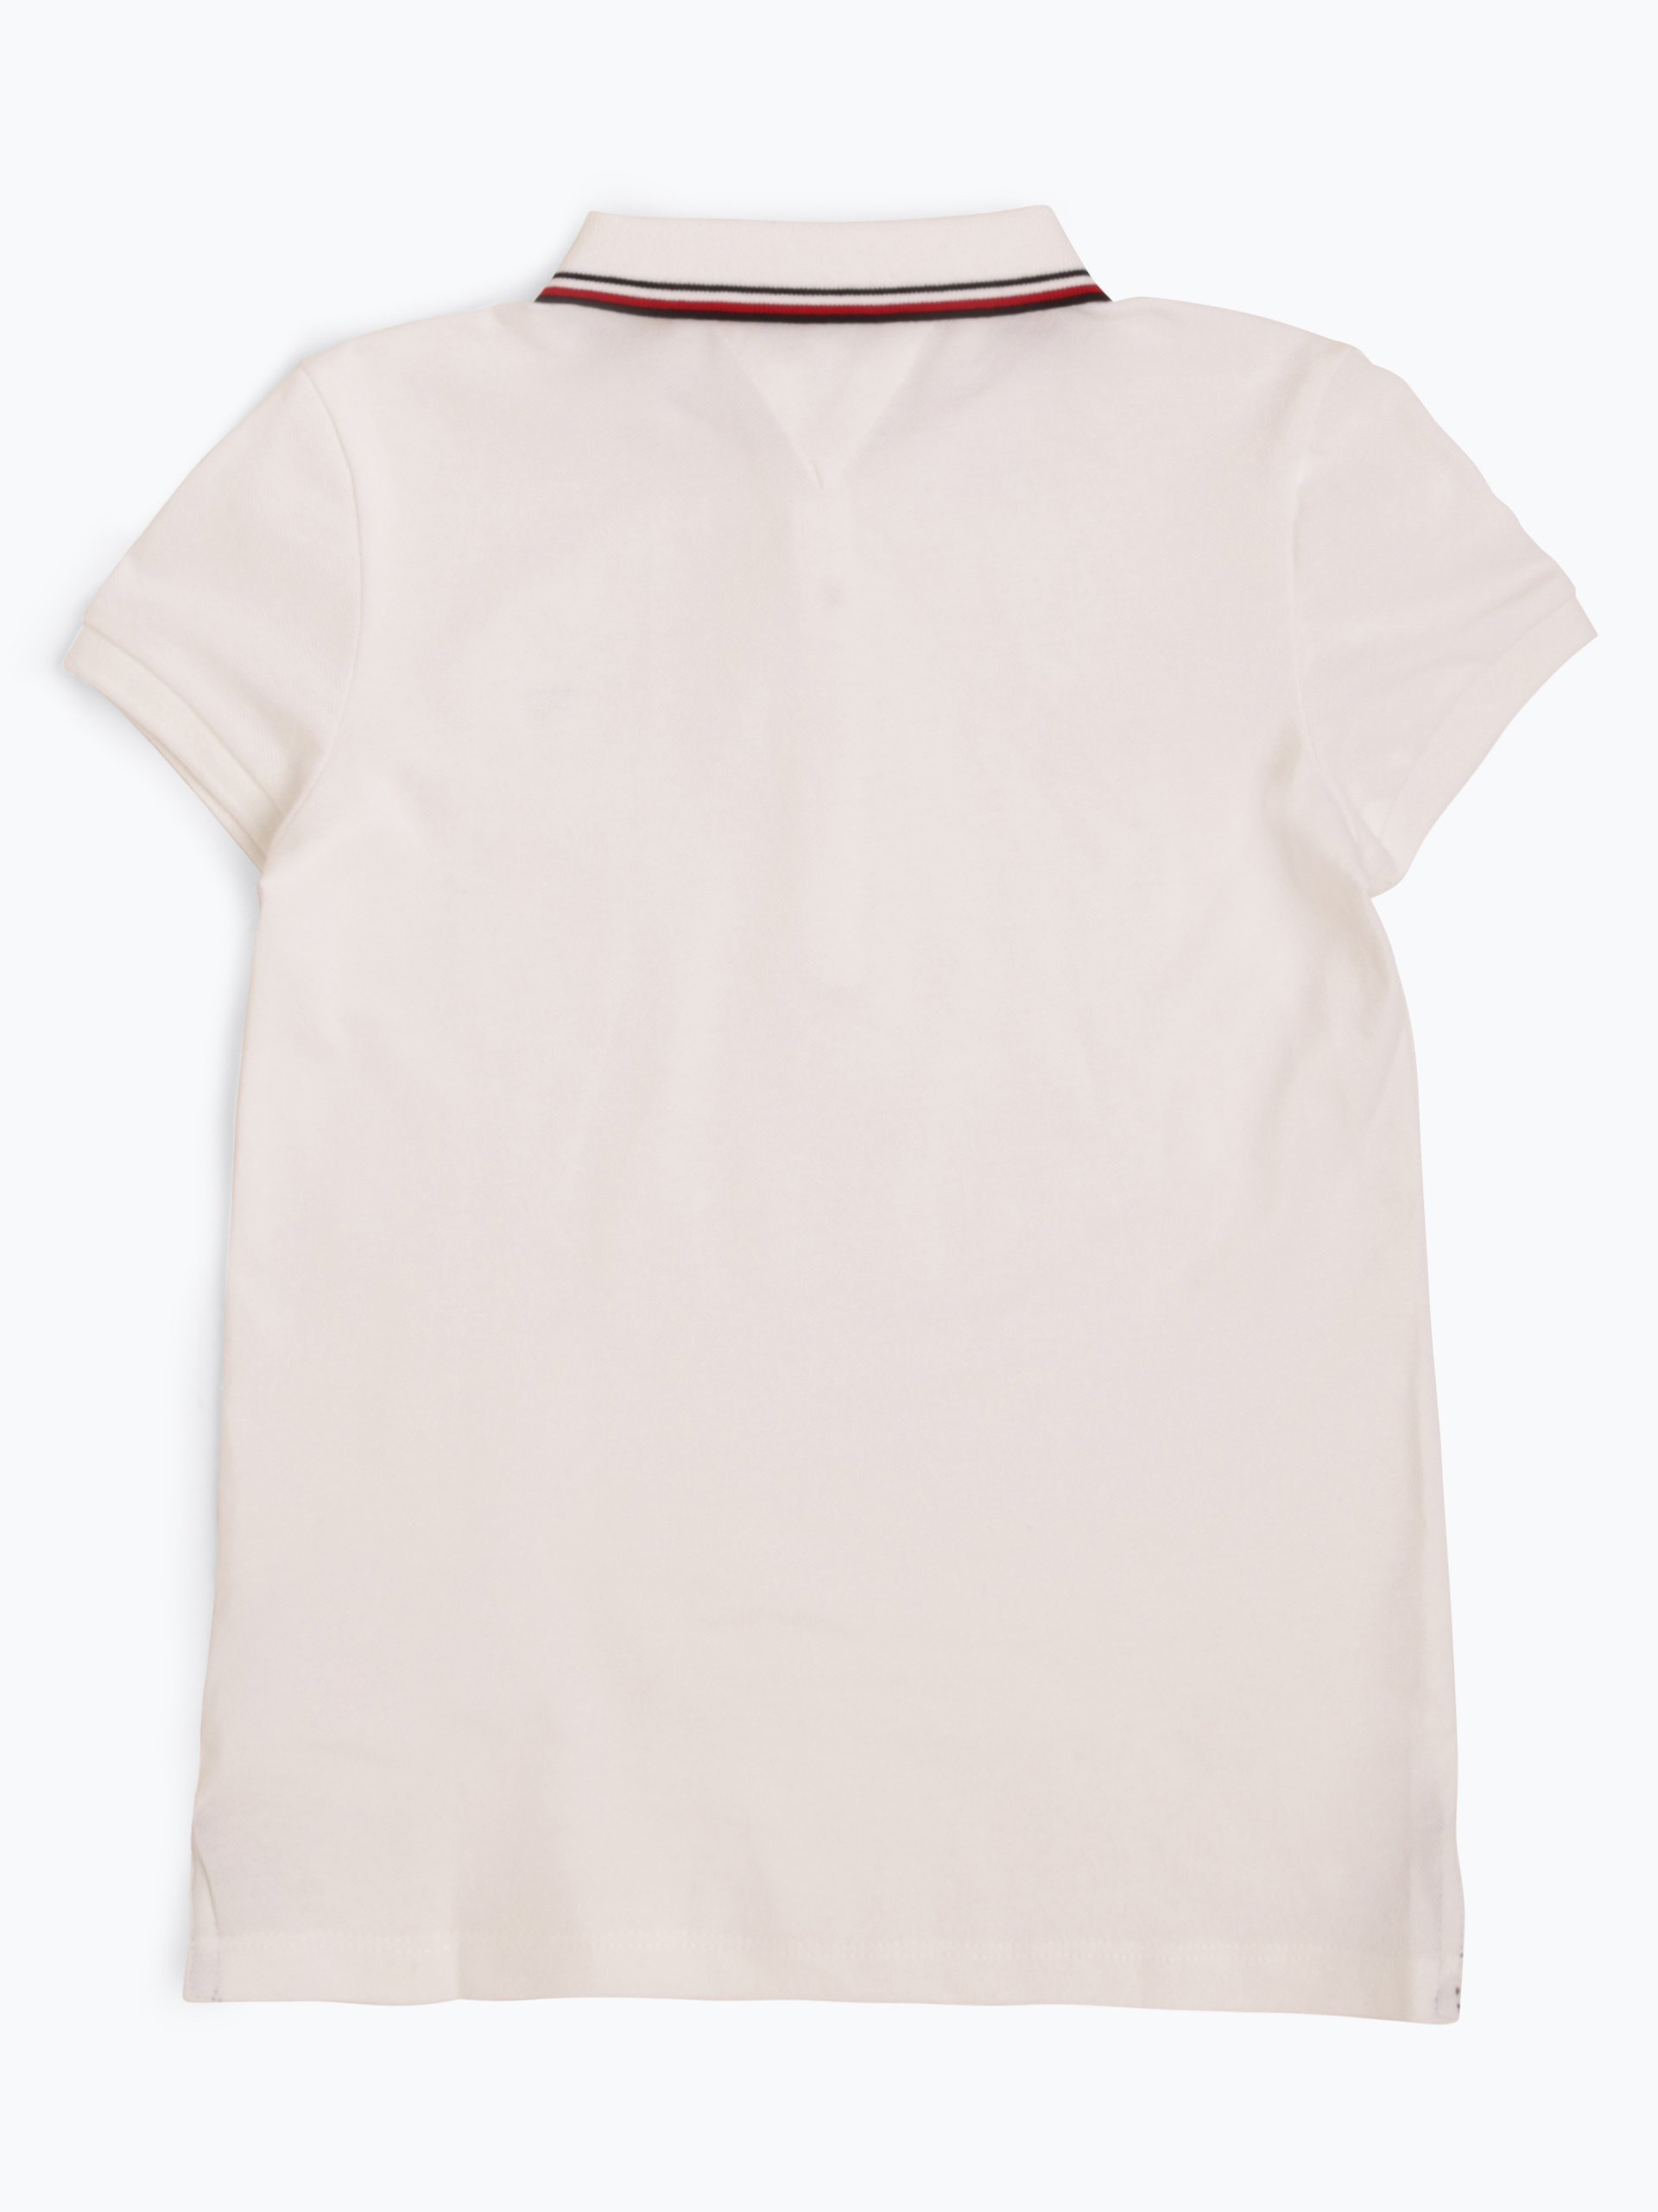 Tommy Hilfiger Mädchen Poloshirt